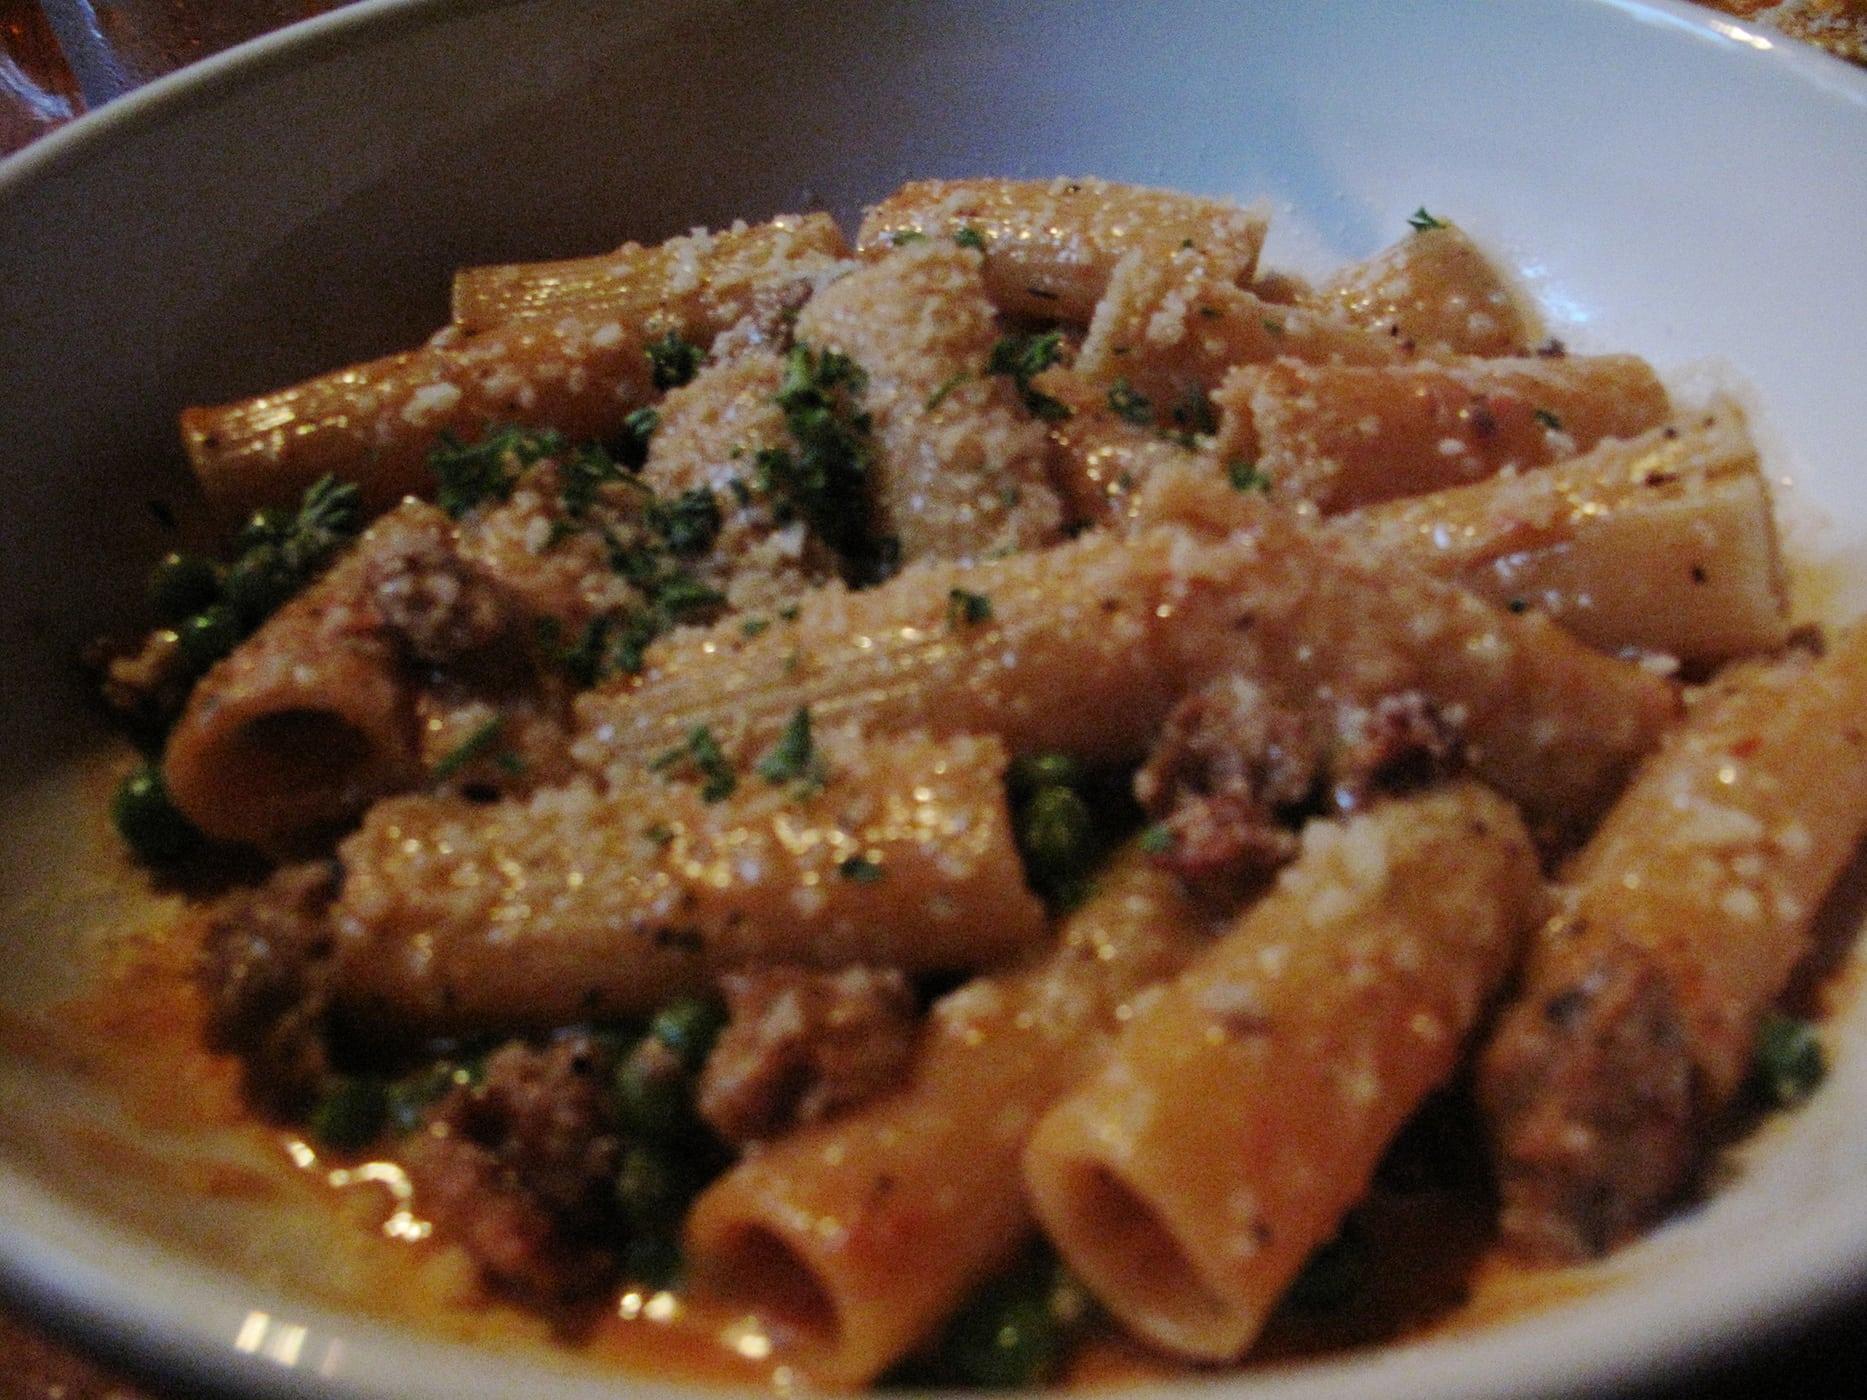 Pasta dinner at Frasca